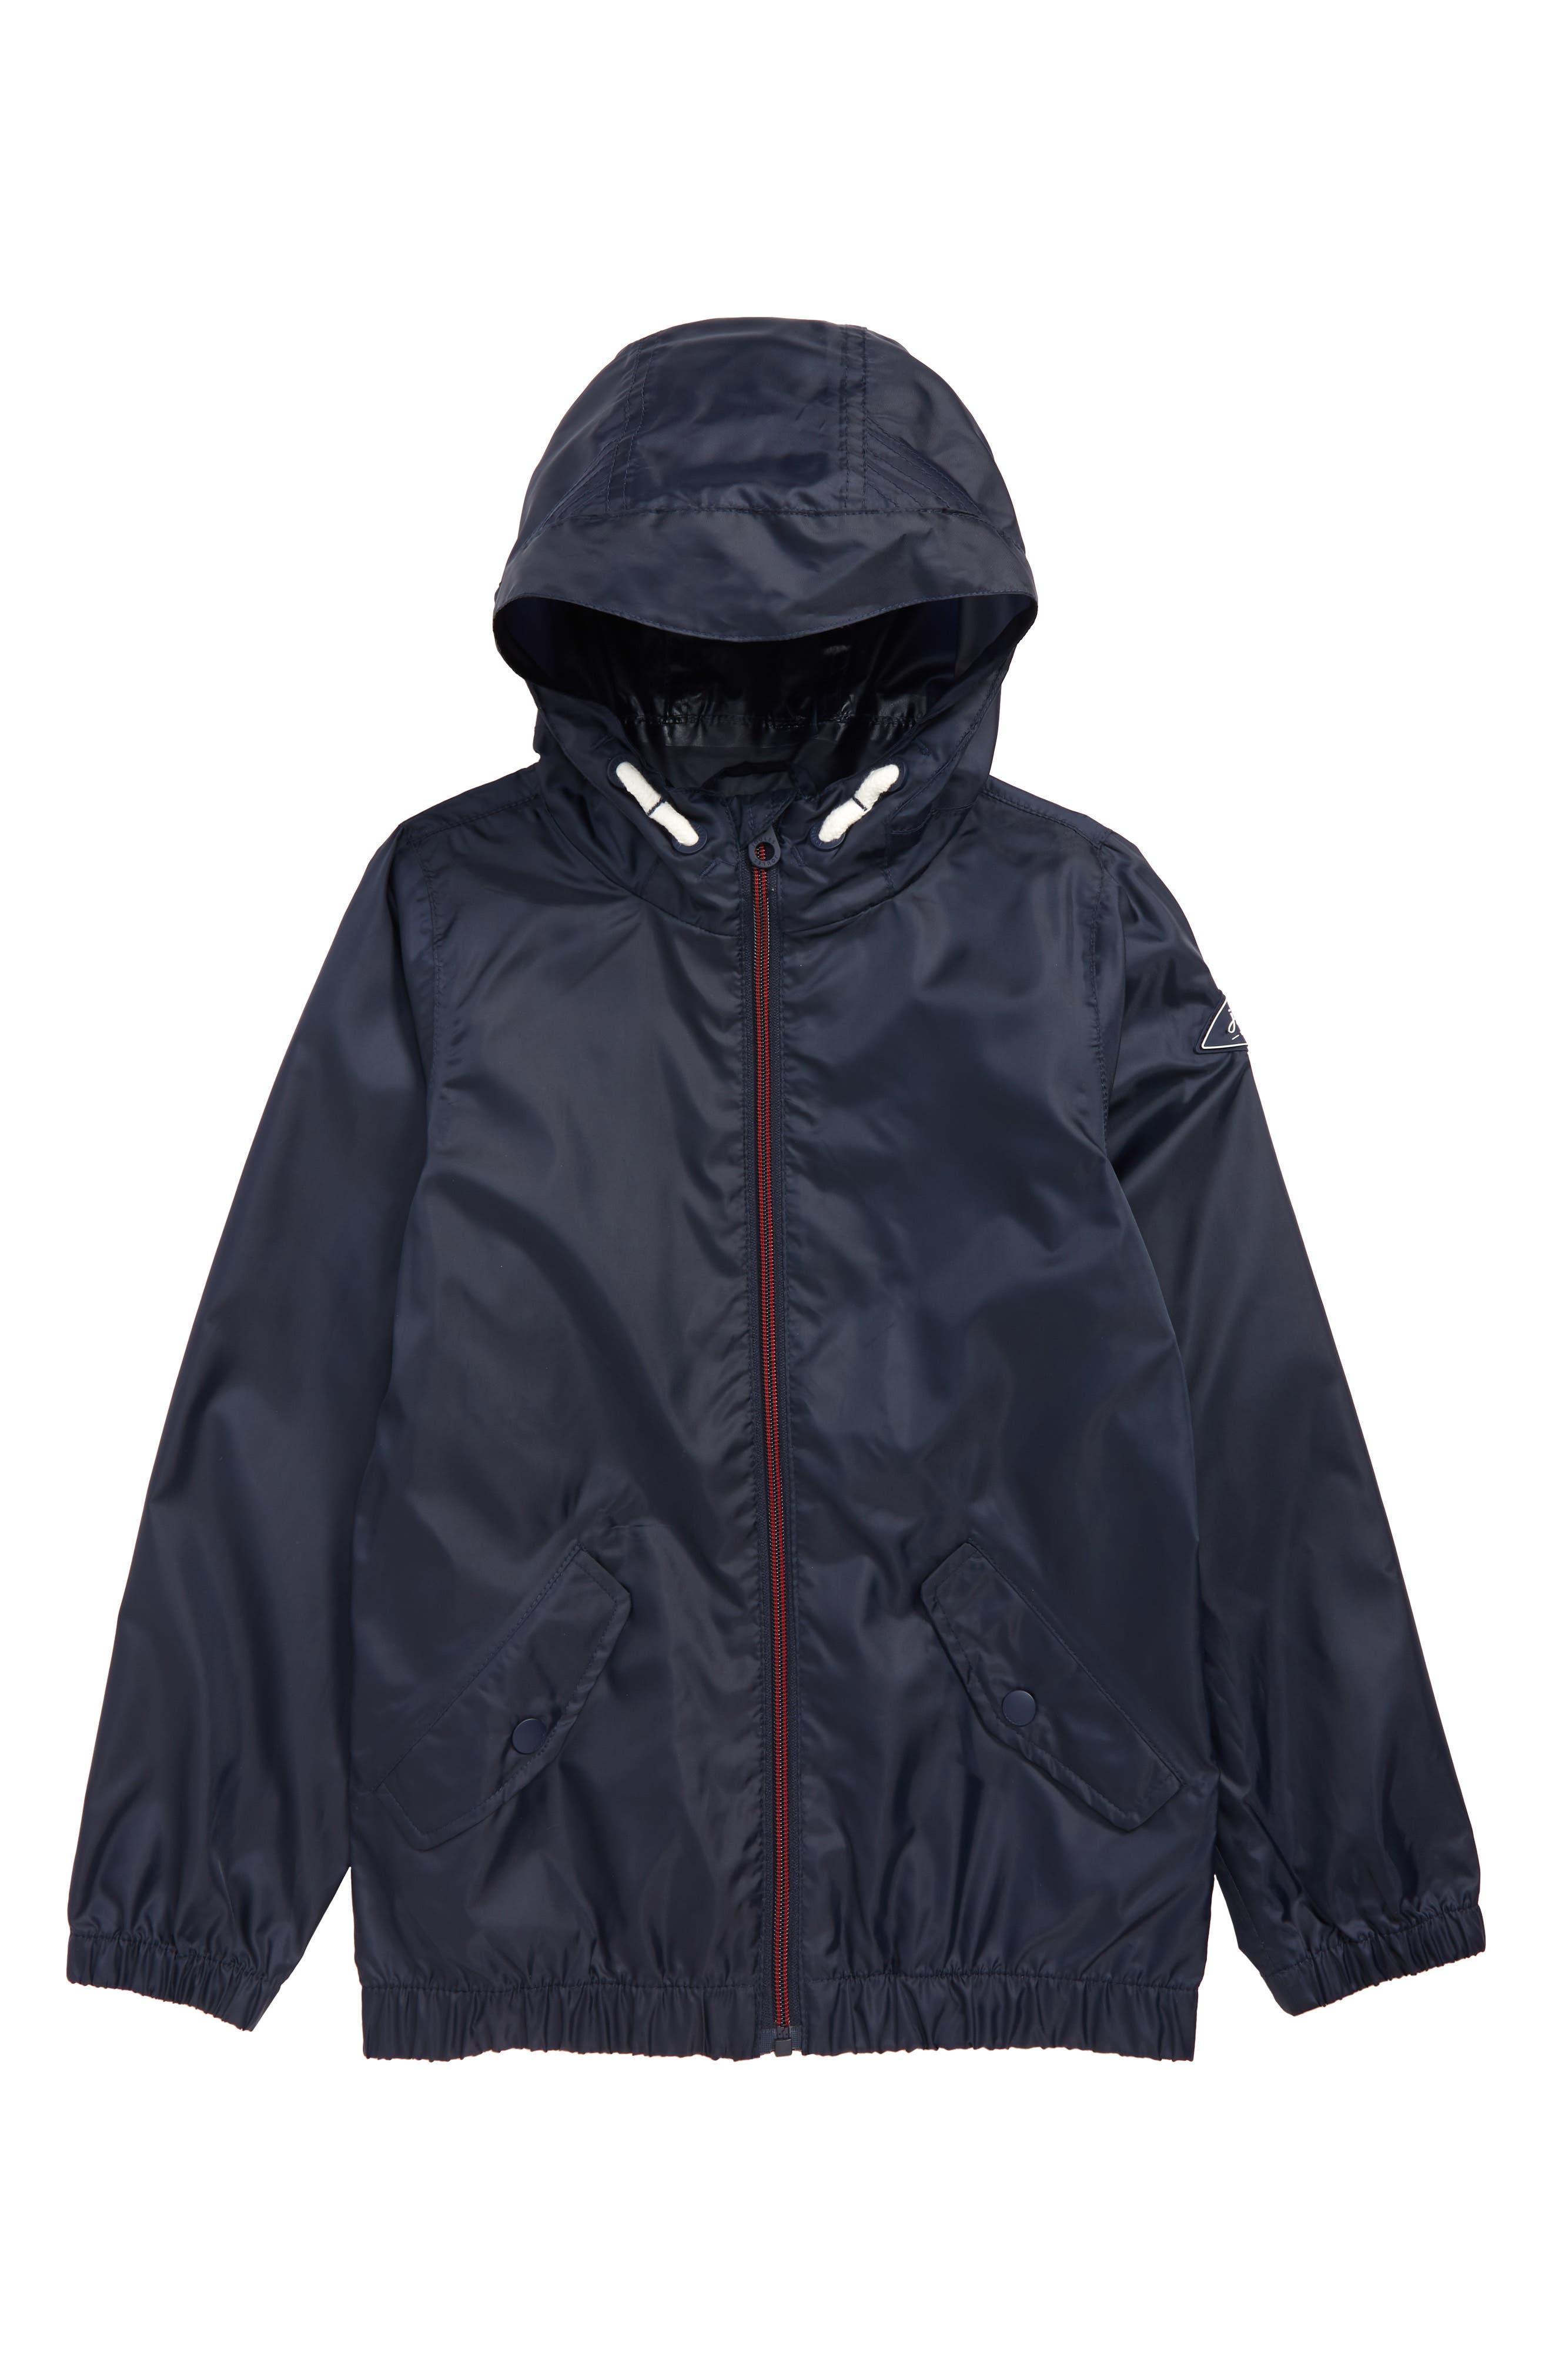 JOULES Rowan Lightweight Packable Jacket, Main, color, NAVY